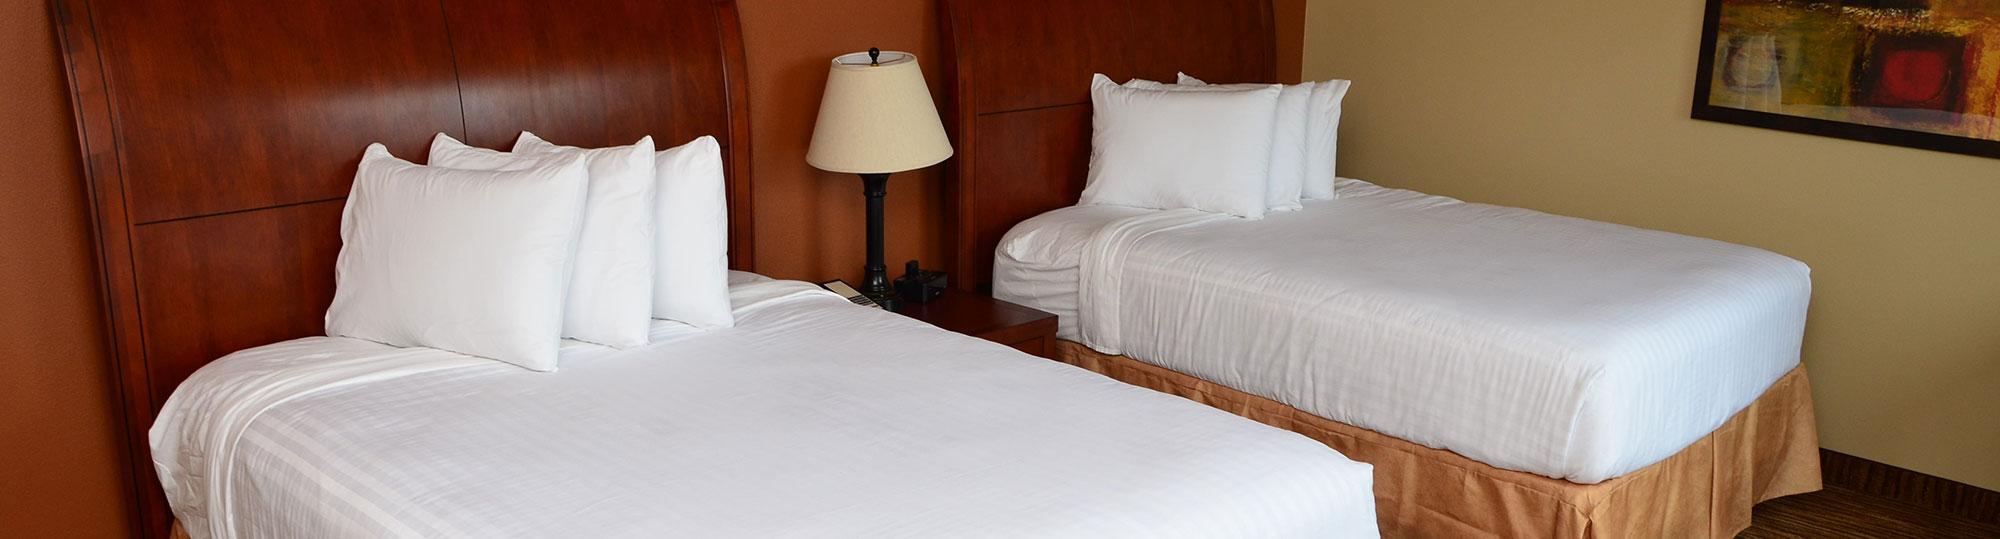 Cobblestone Inn and Suites Newton